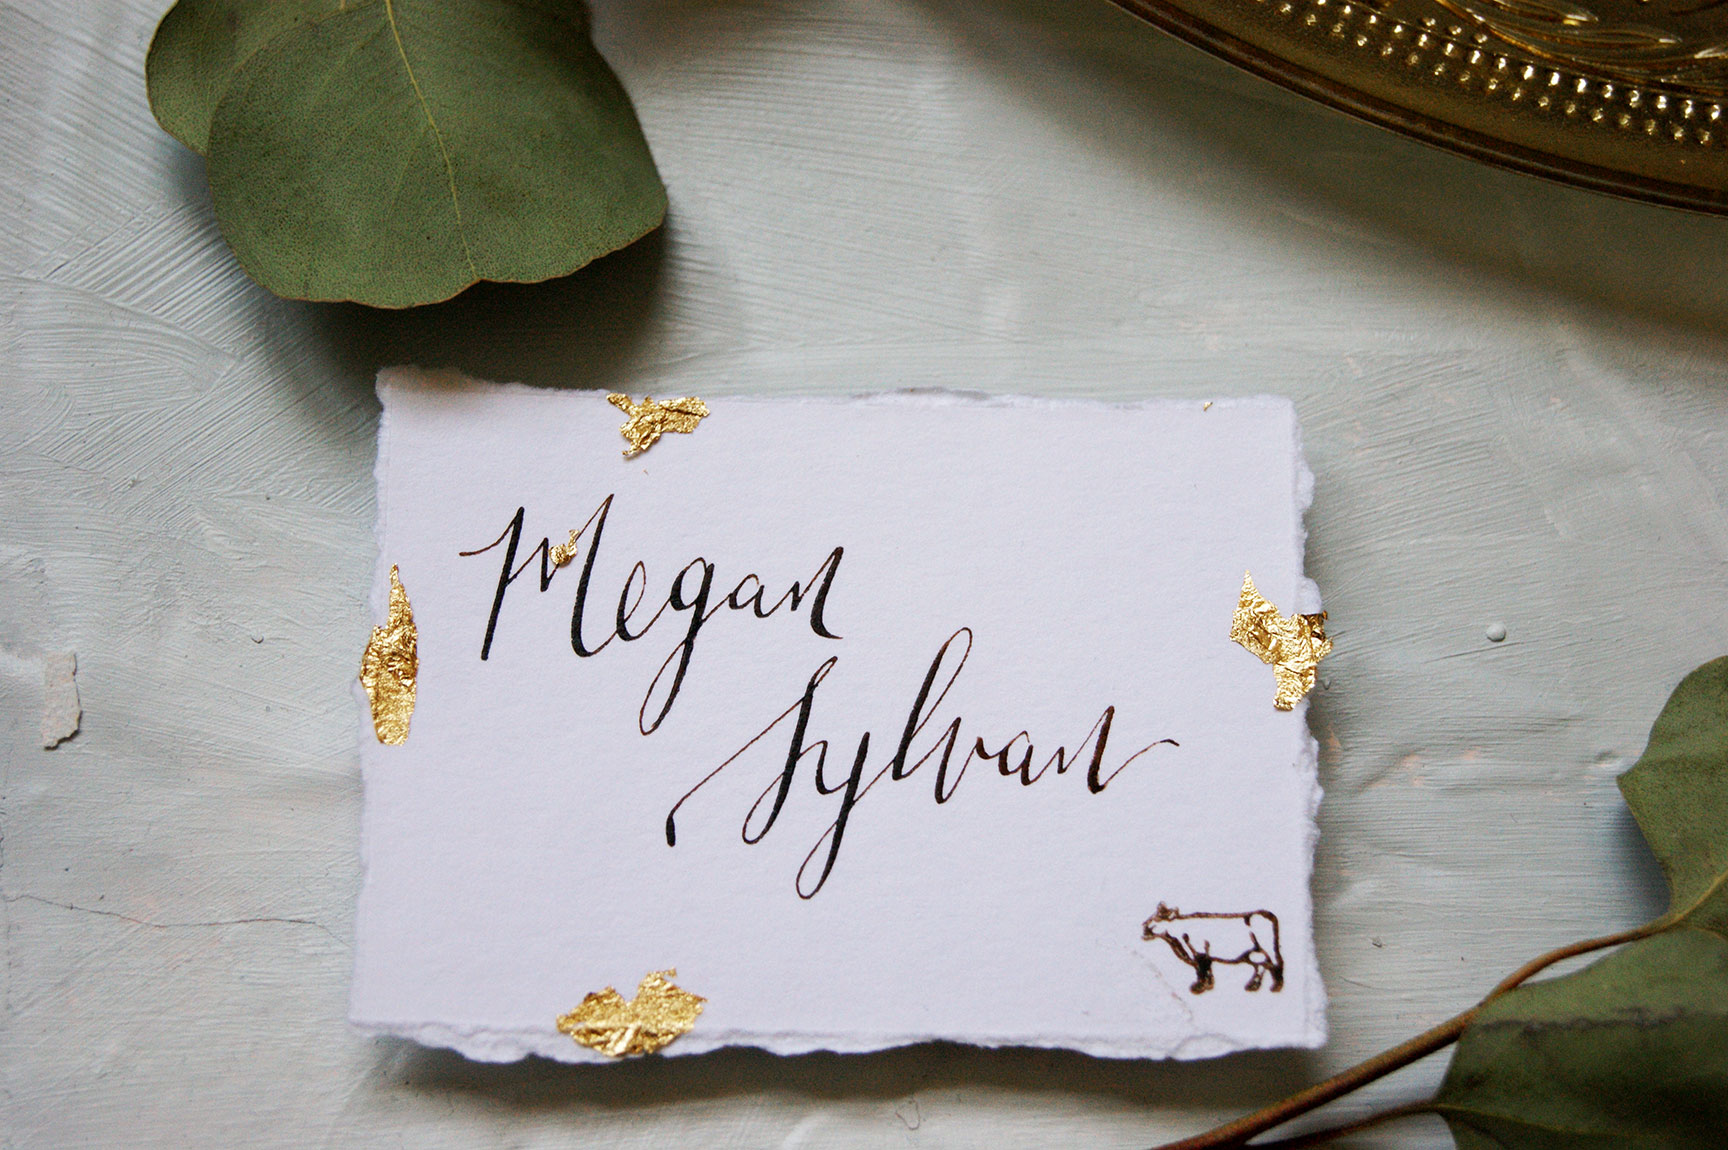 Kiawah Island Wedding Place Card